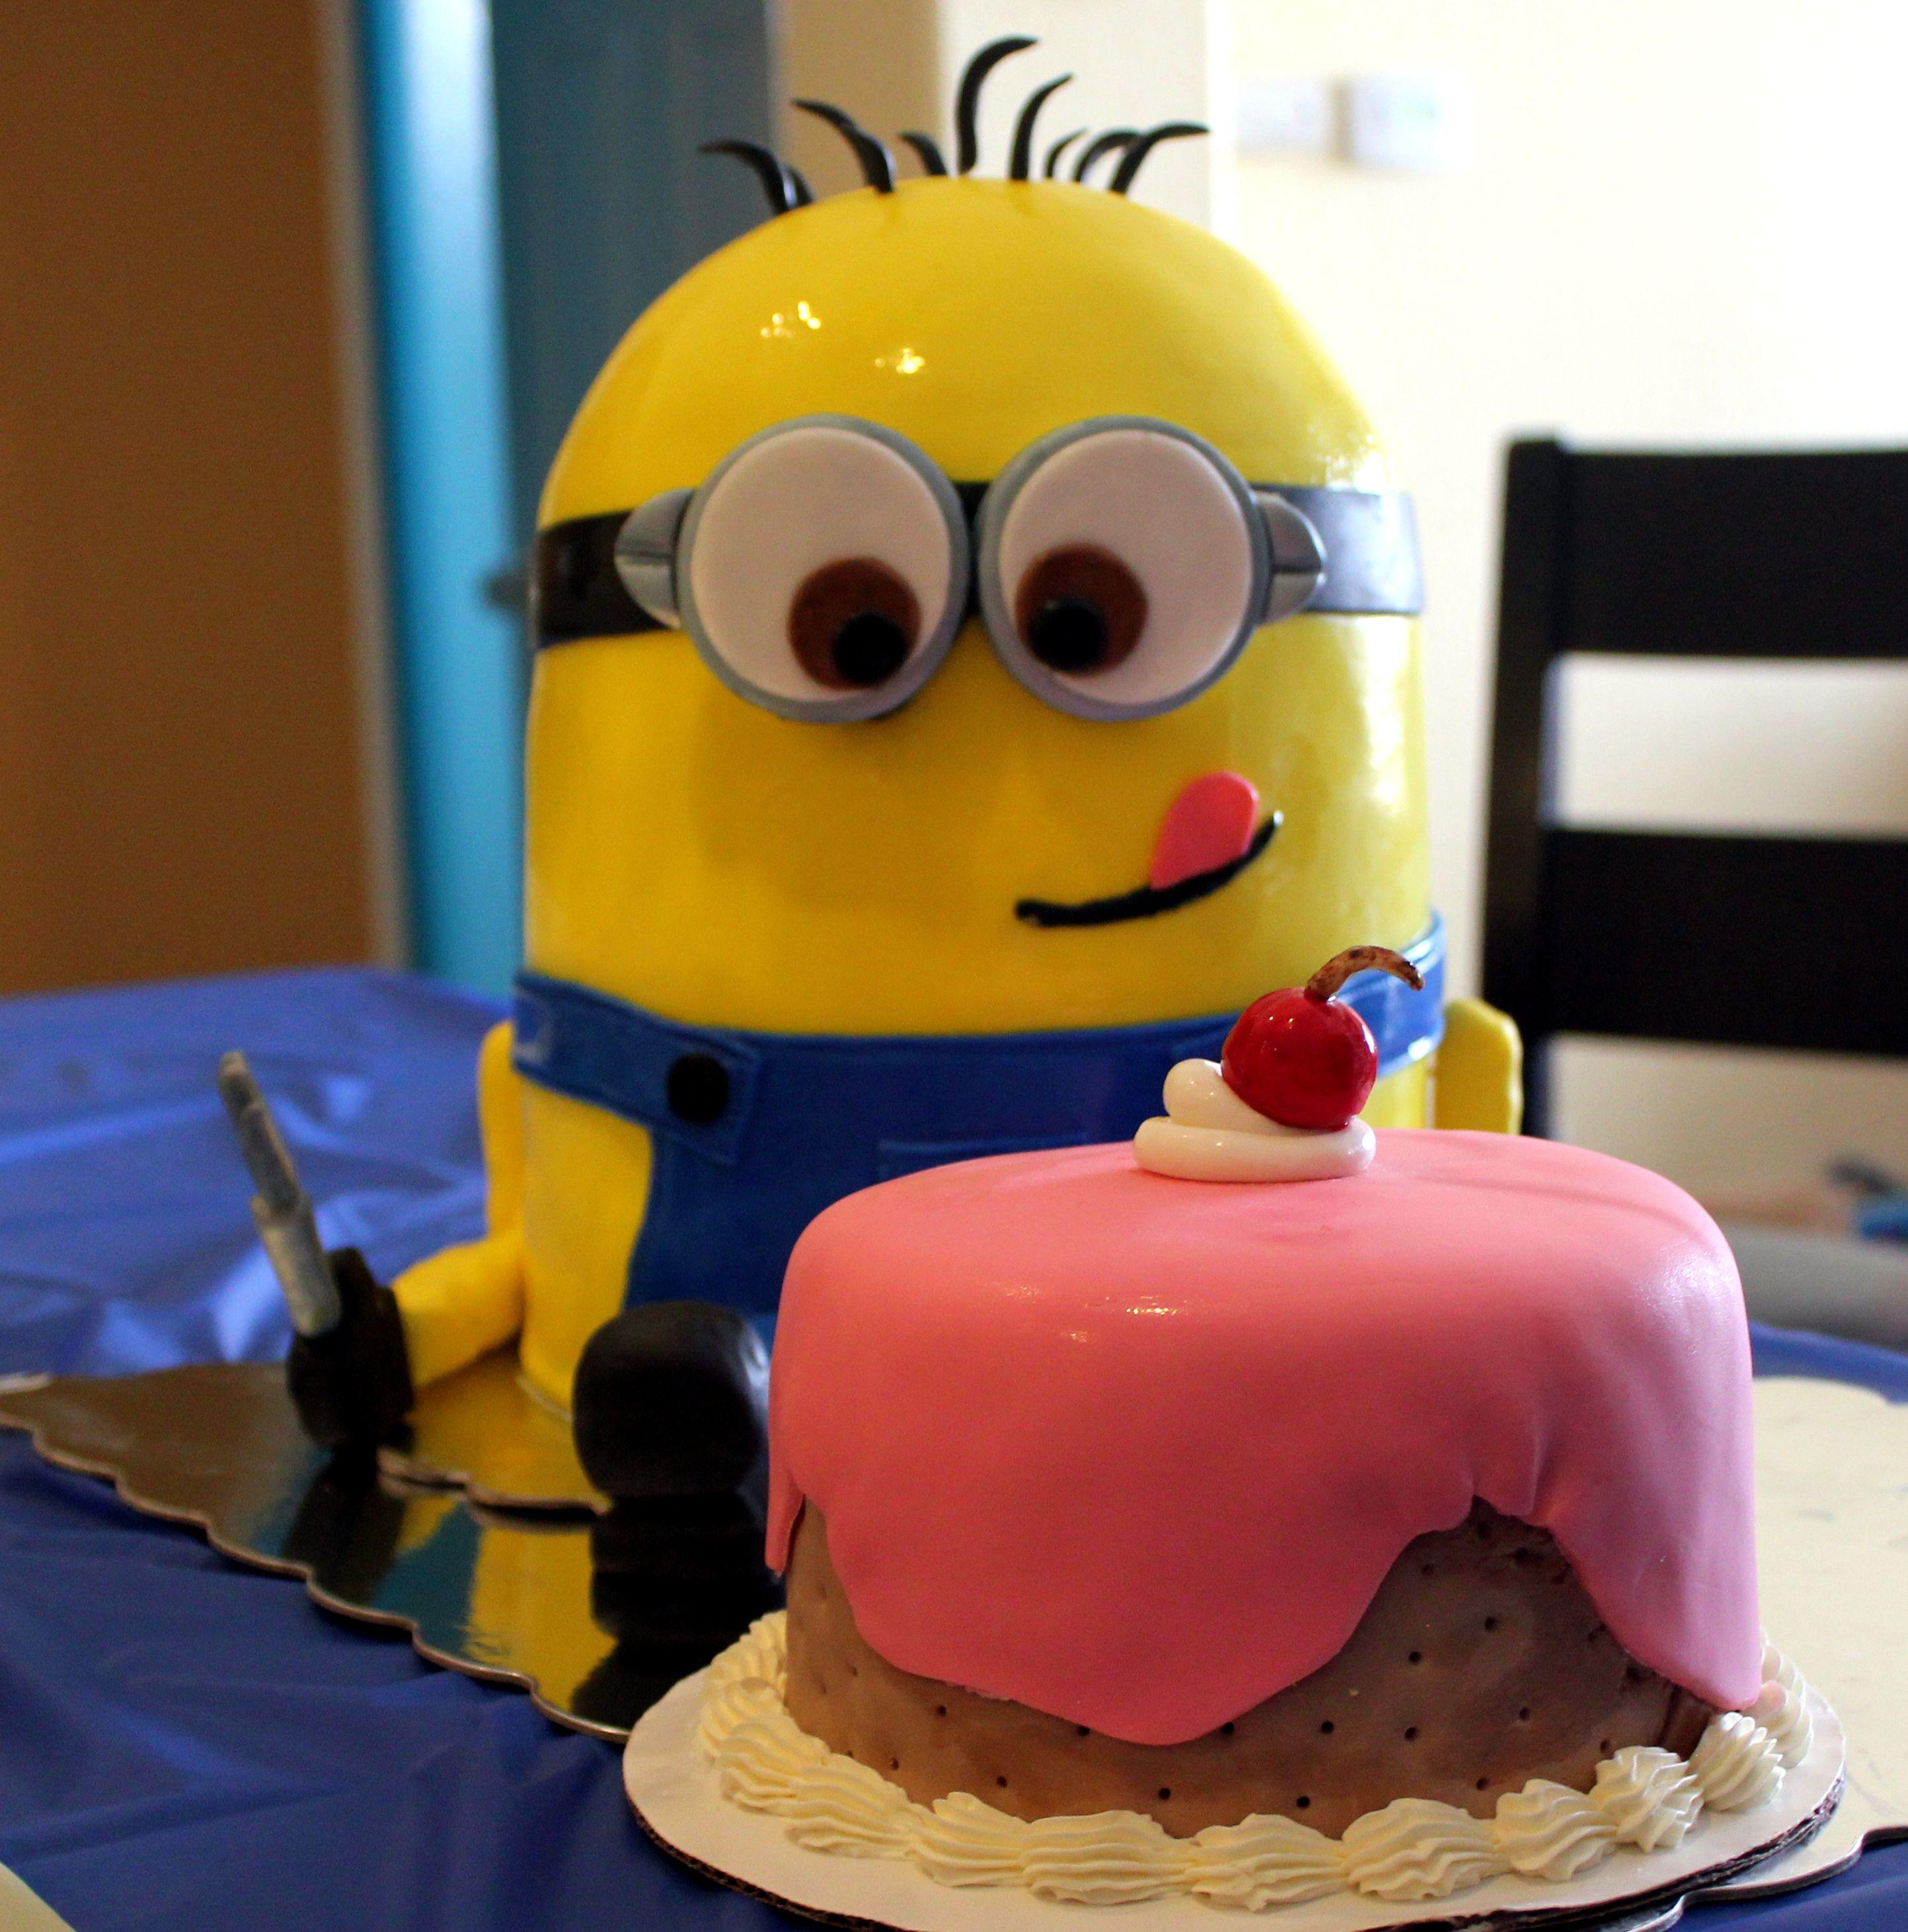 Minion Cake Design Pinterest : Pinterest Minion Cake Ideas 6391 Minion Cake Cake Designs